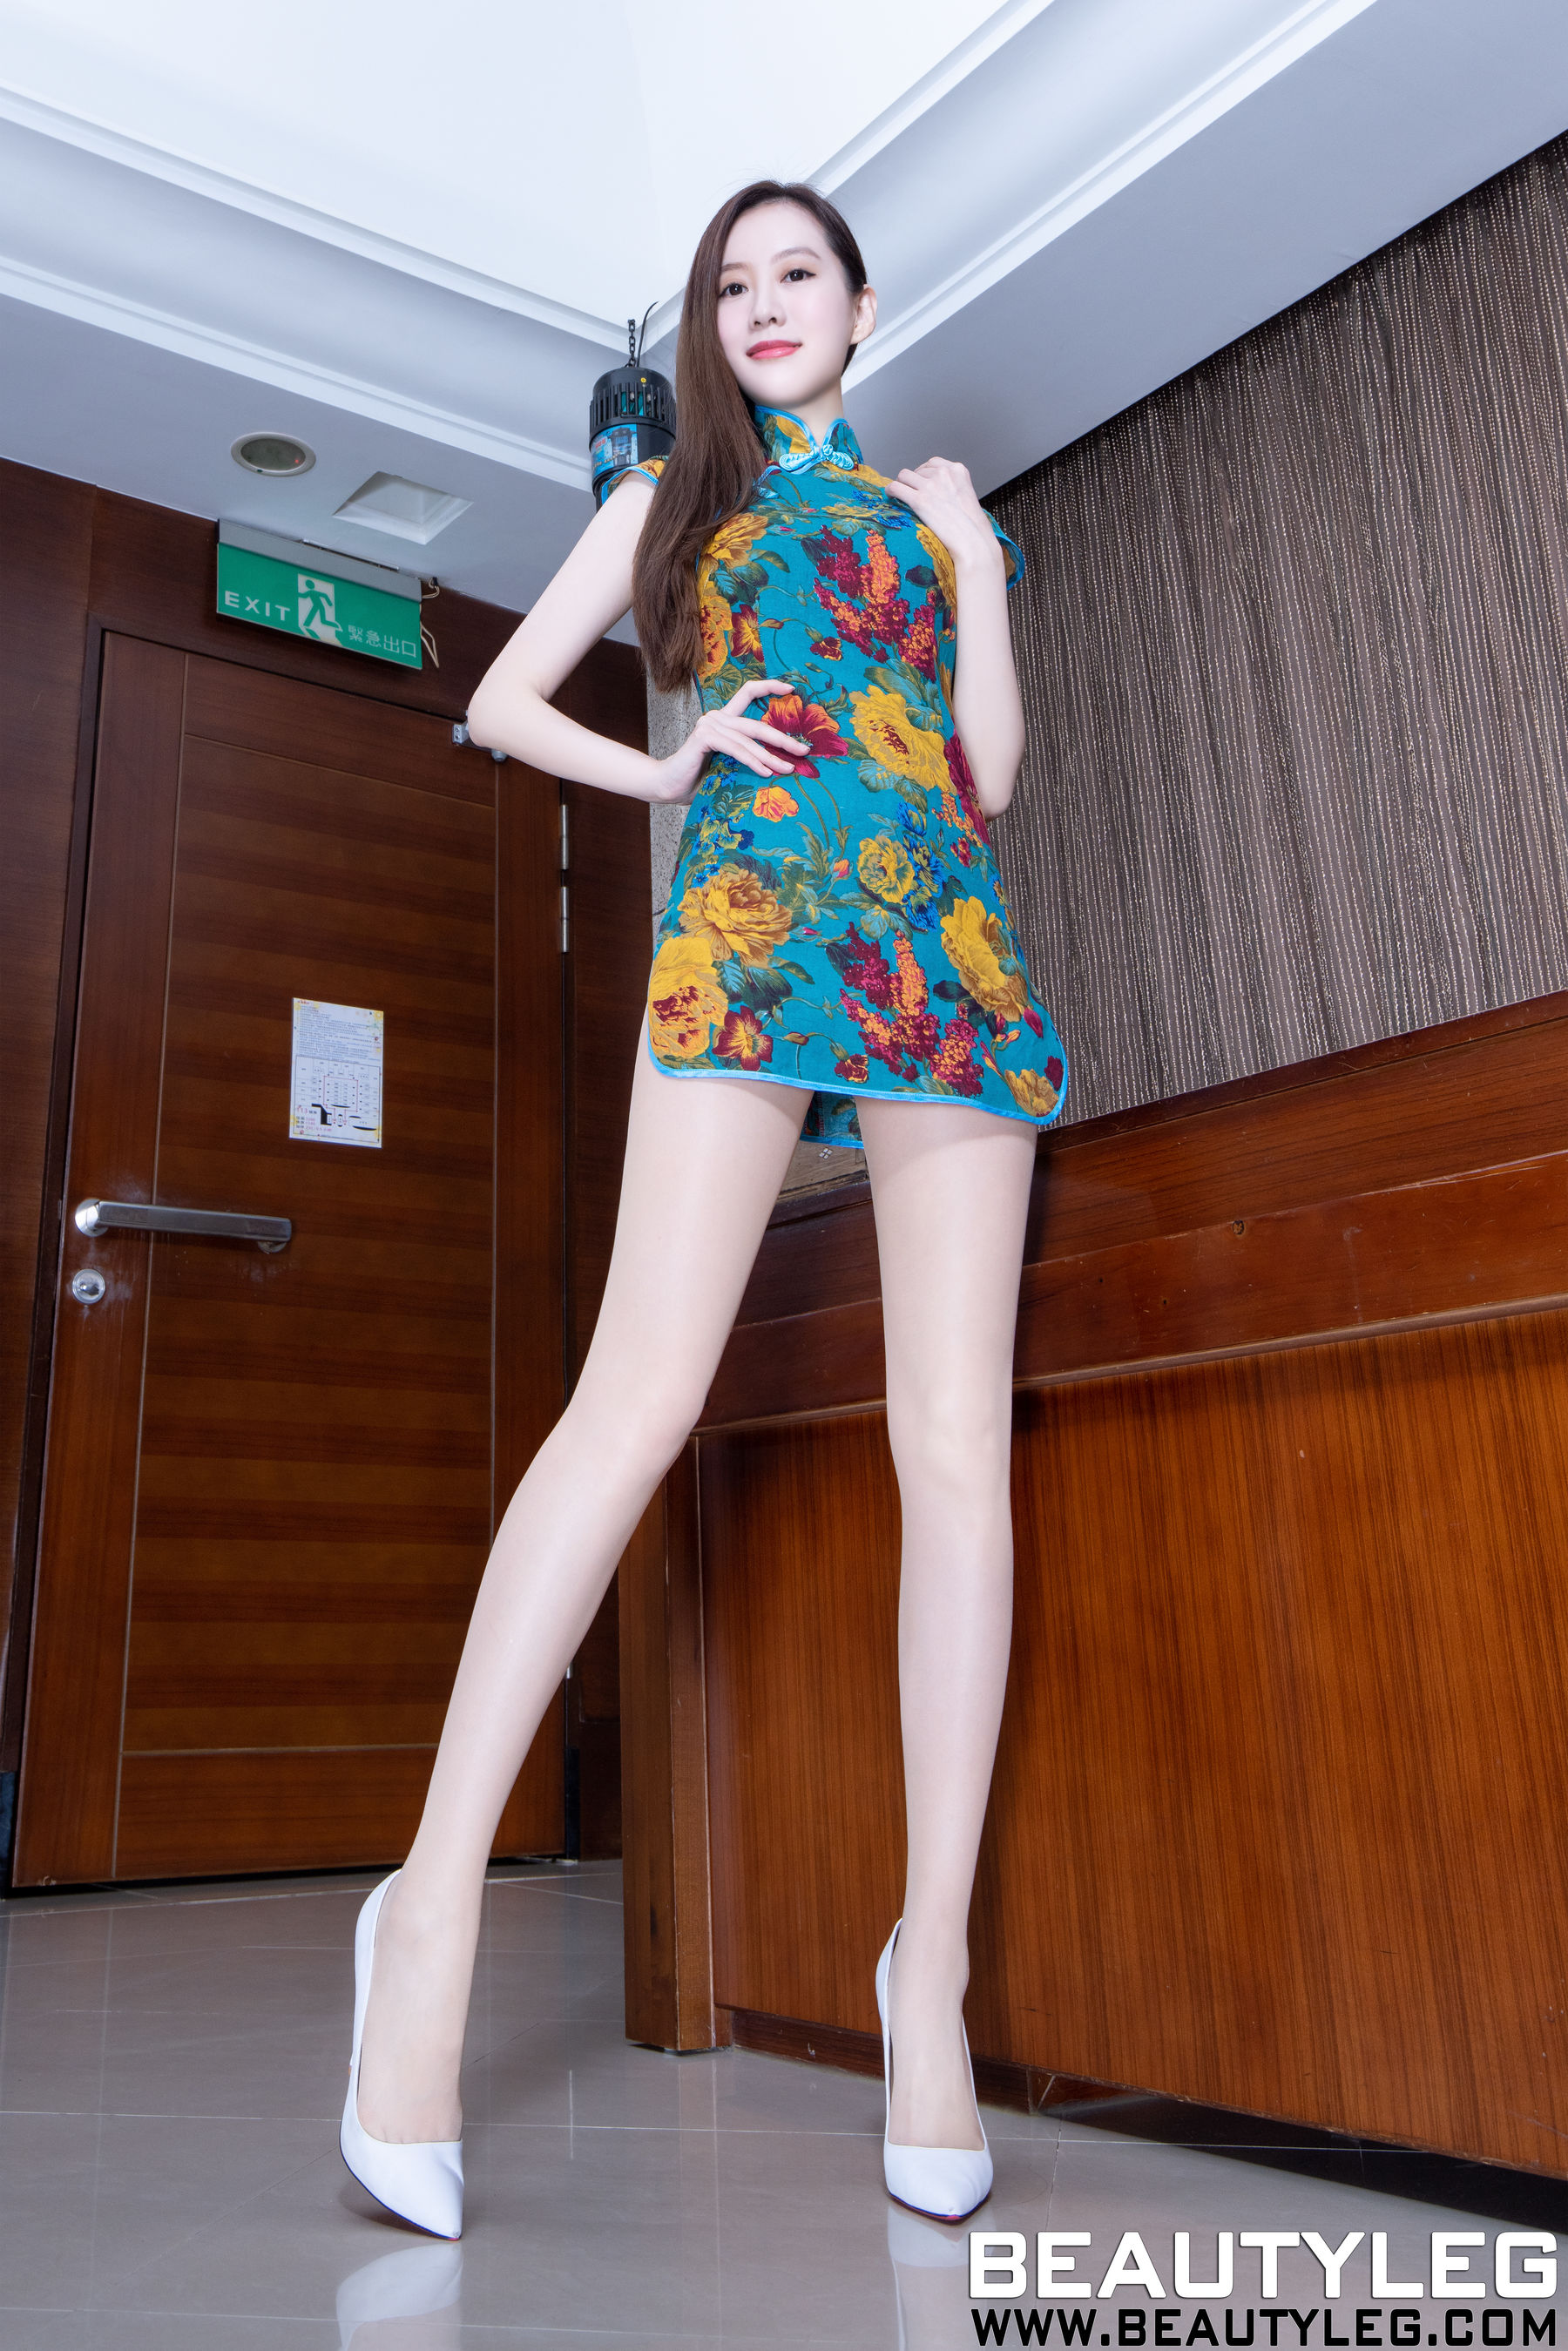 VOL.94 [Beautyleg]高跟美腿:董靓予(腿模Penny)超高清个人性感漂亮大图(46P)